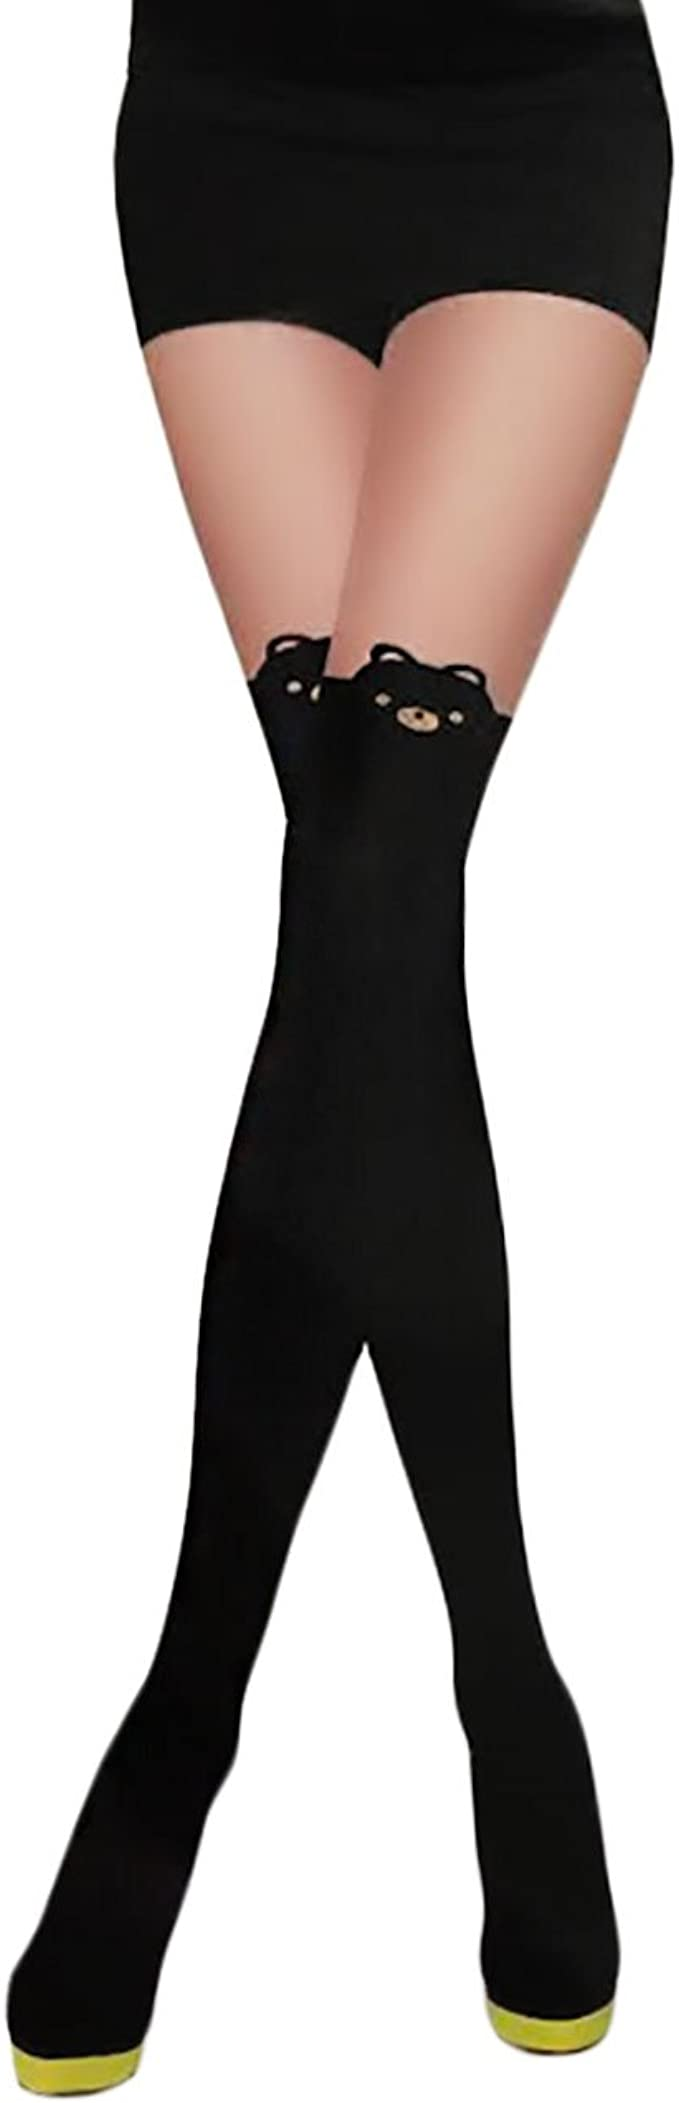 Calze collant donna Orso Orsetto Bear nero fashion Kawaii nuove party P48